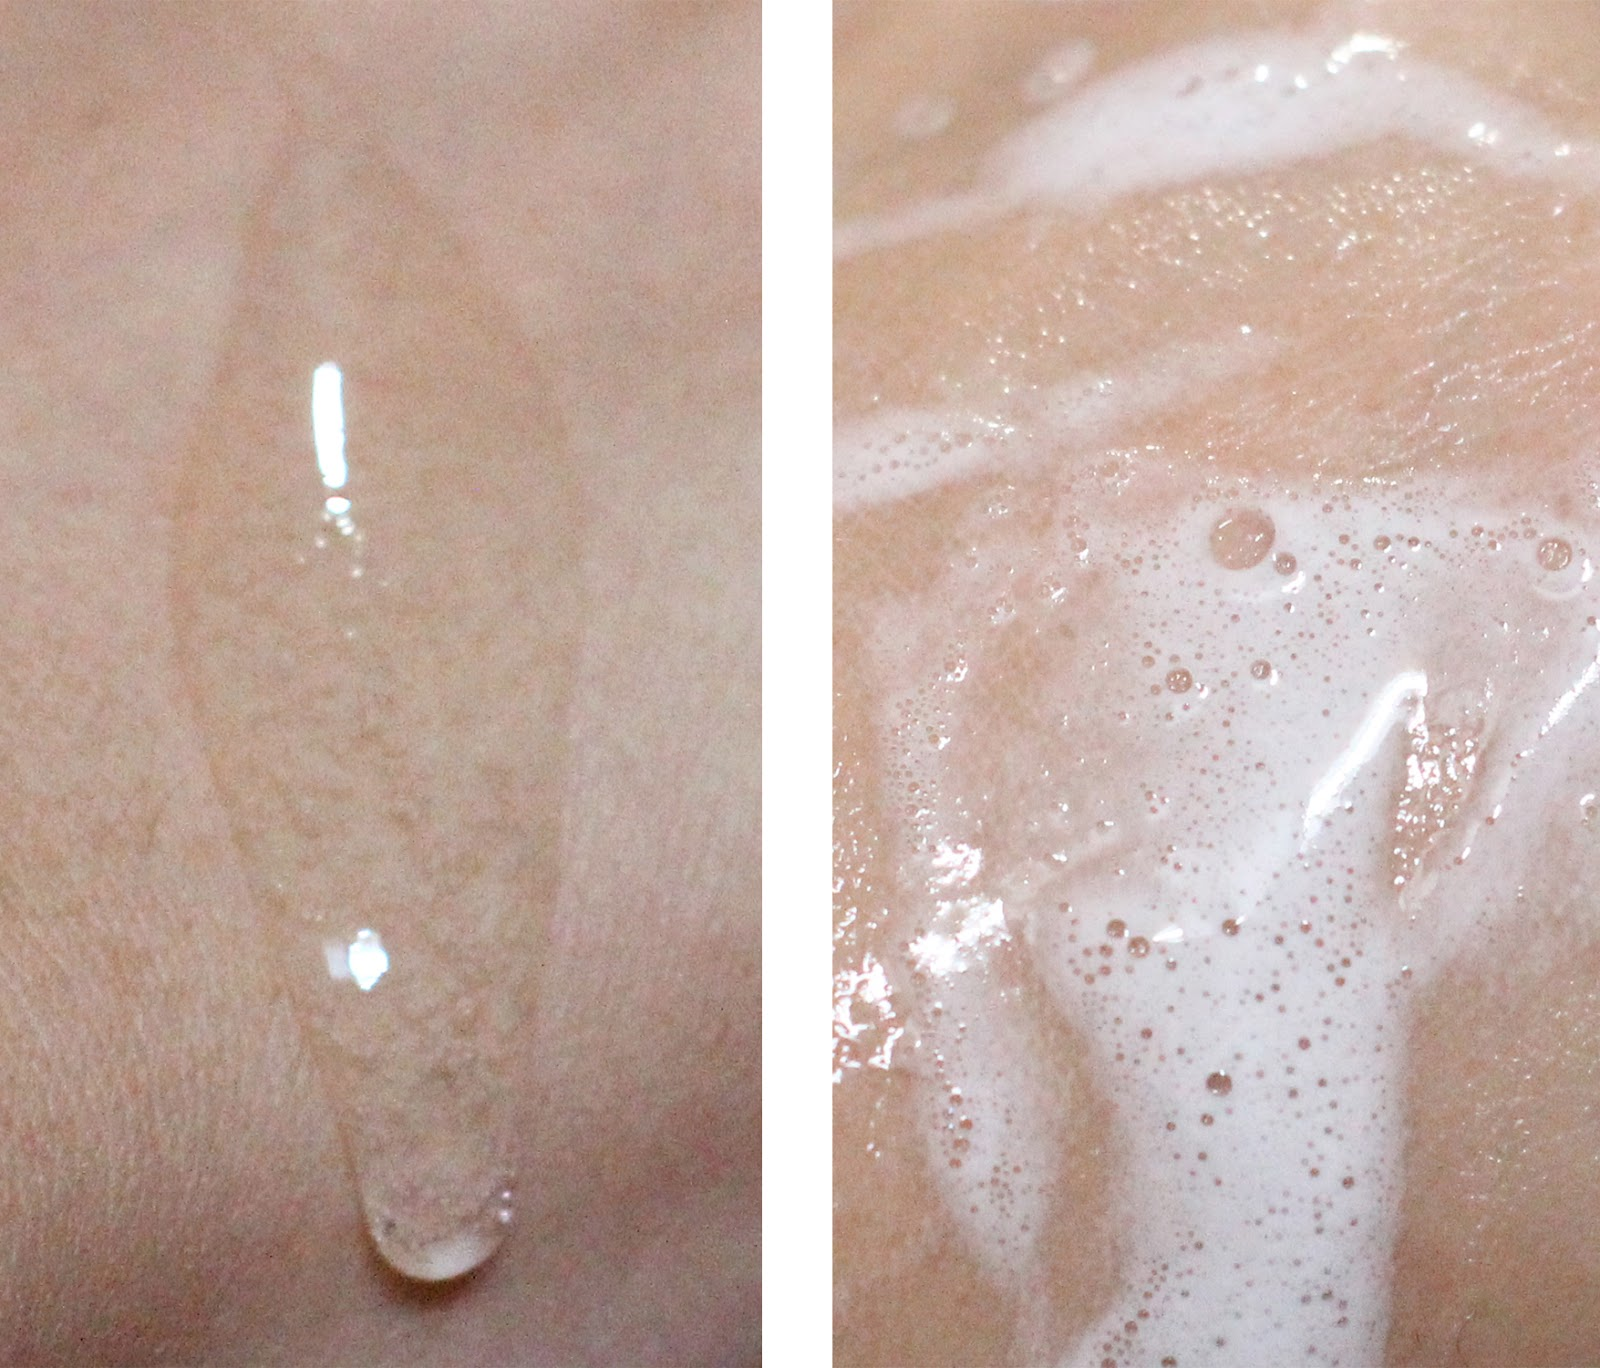 Lalas Wonderland Beauty Blogger Indonesia On Feedspot Rss Feed Sabun Pemutih Wajah Melon Original Lightening Glosy Setelah Cuci Muka Dengan Menggunakan Produk Ini Nggak Bikin Kulit Aku Jadi Kering Atau Terasa Ketarik Gitu